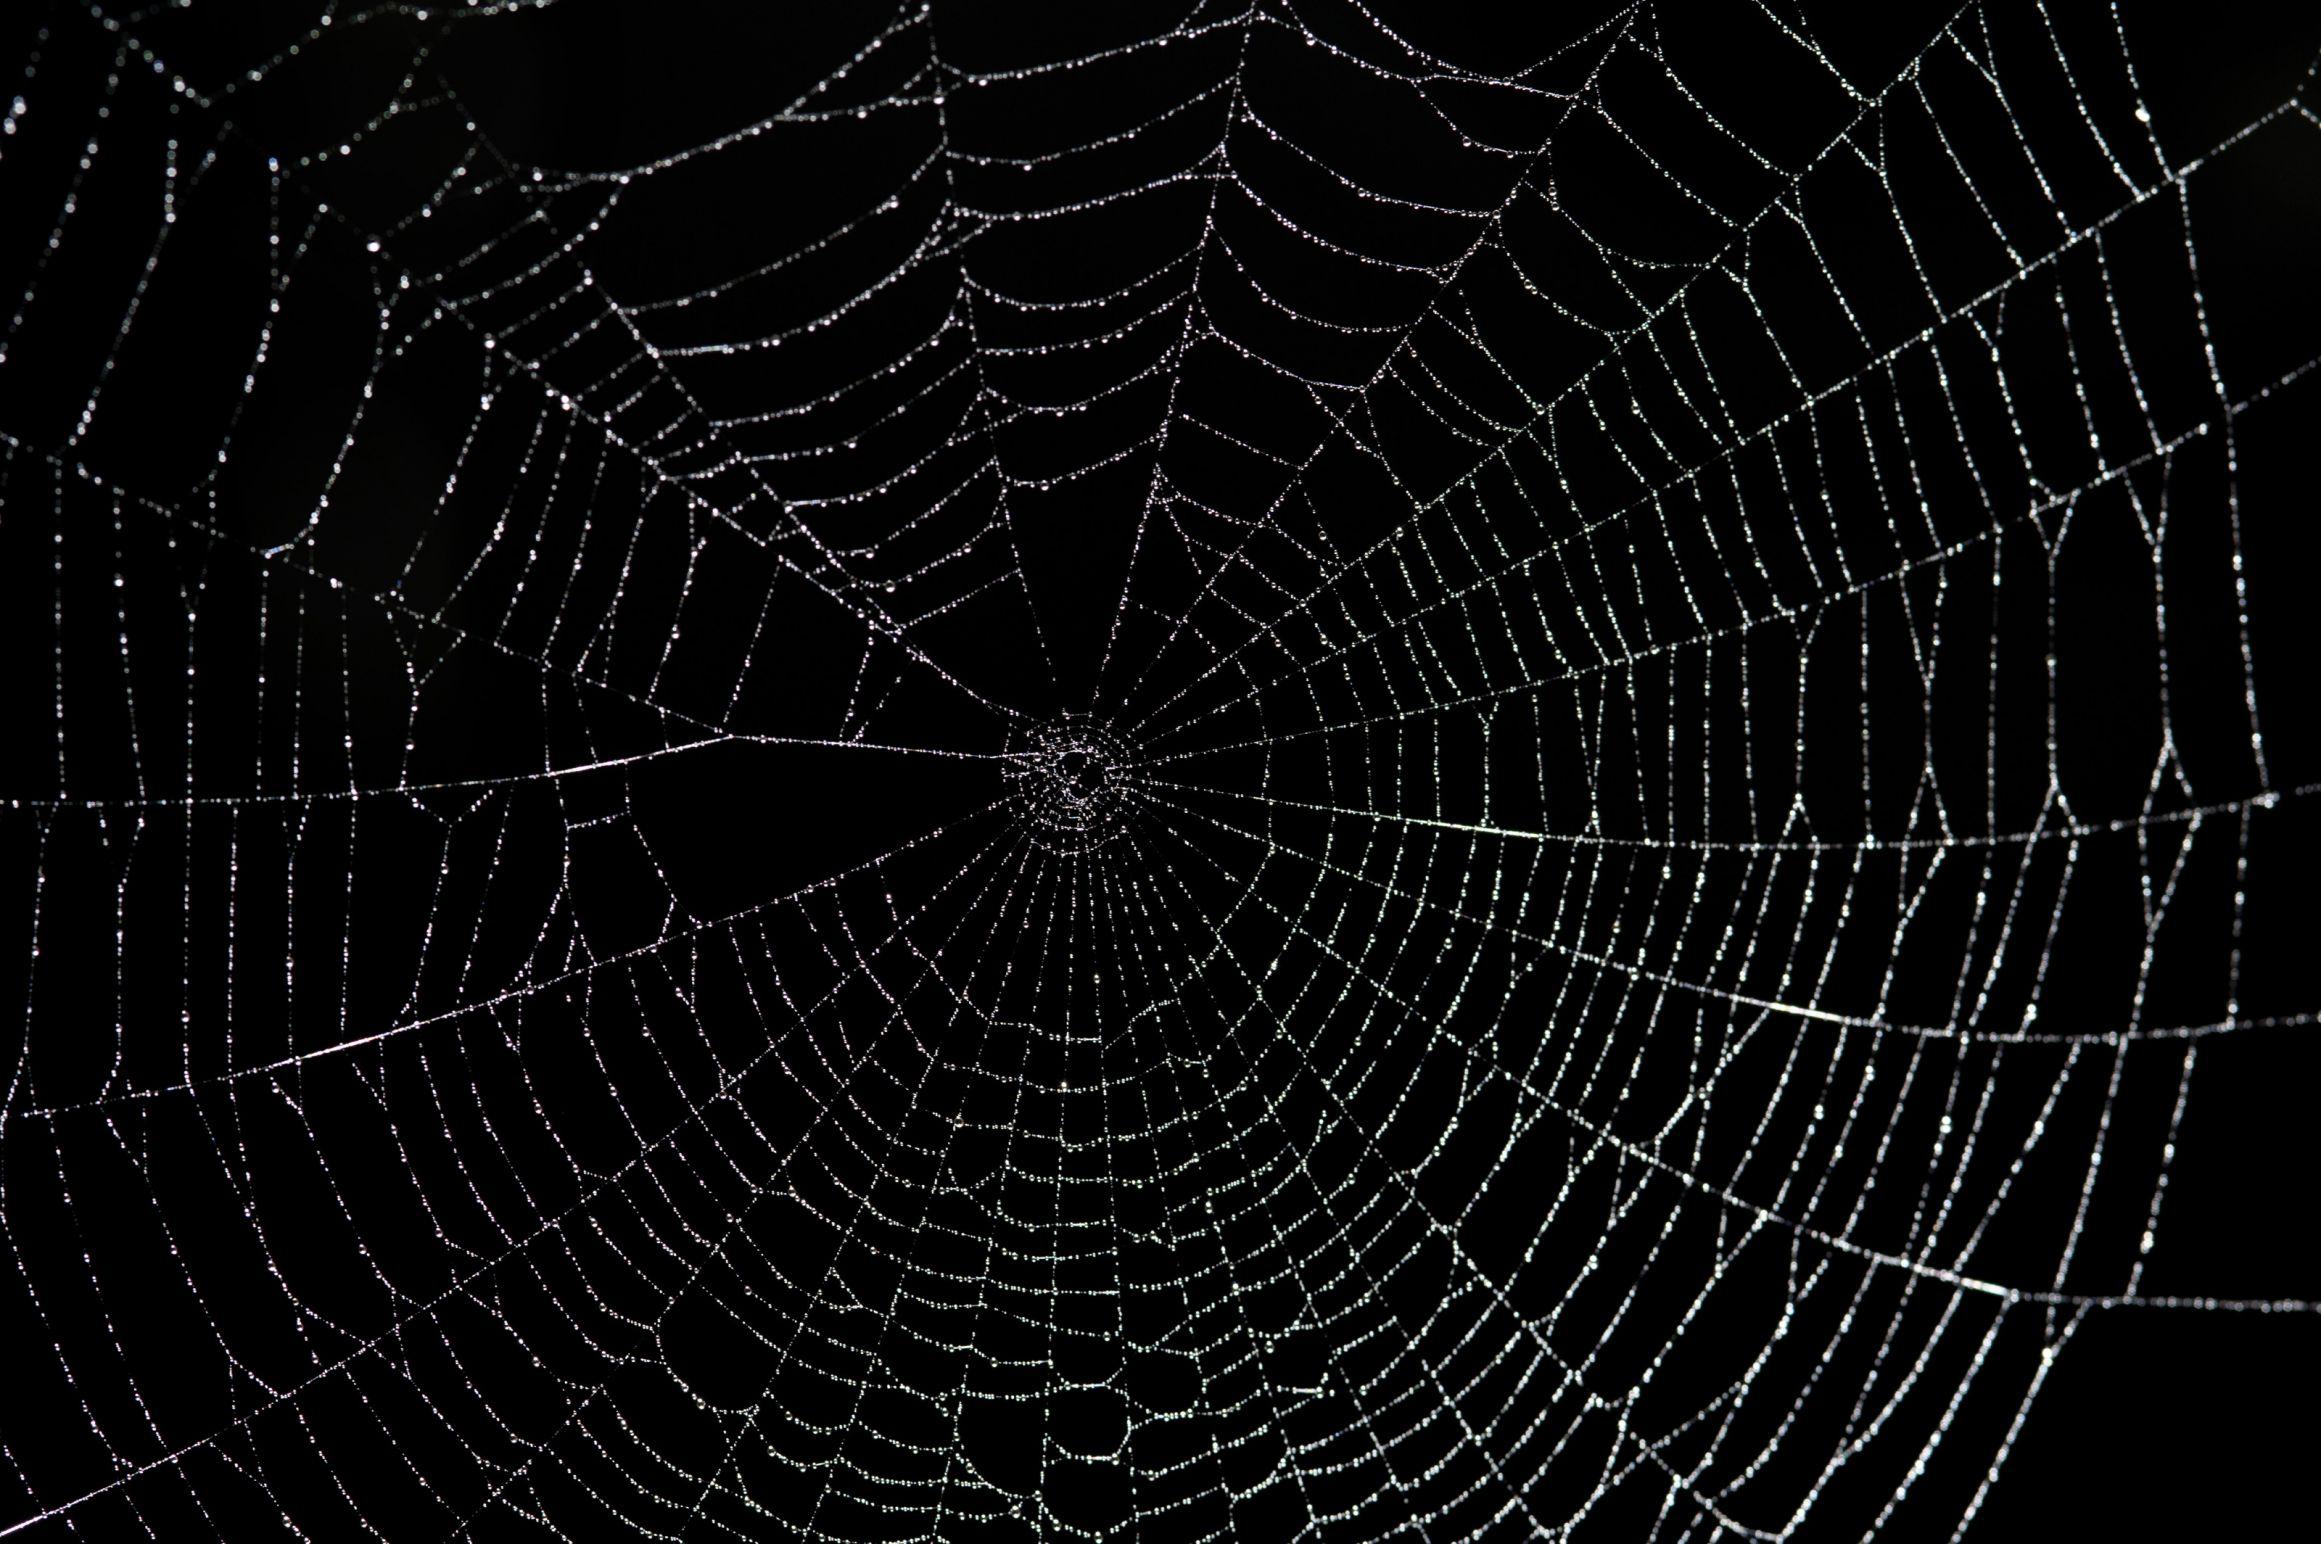 Spider Web Meme Generator - Imgflip